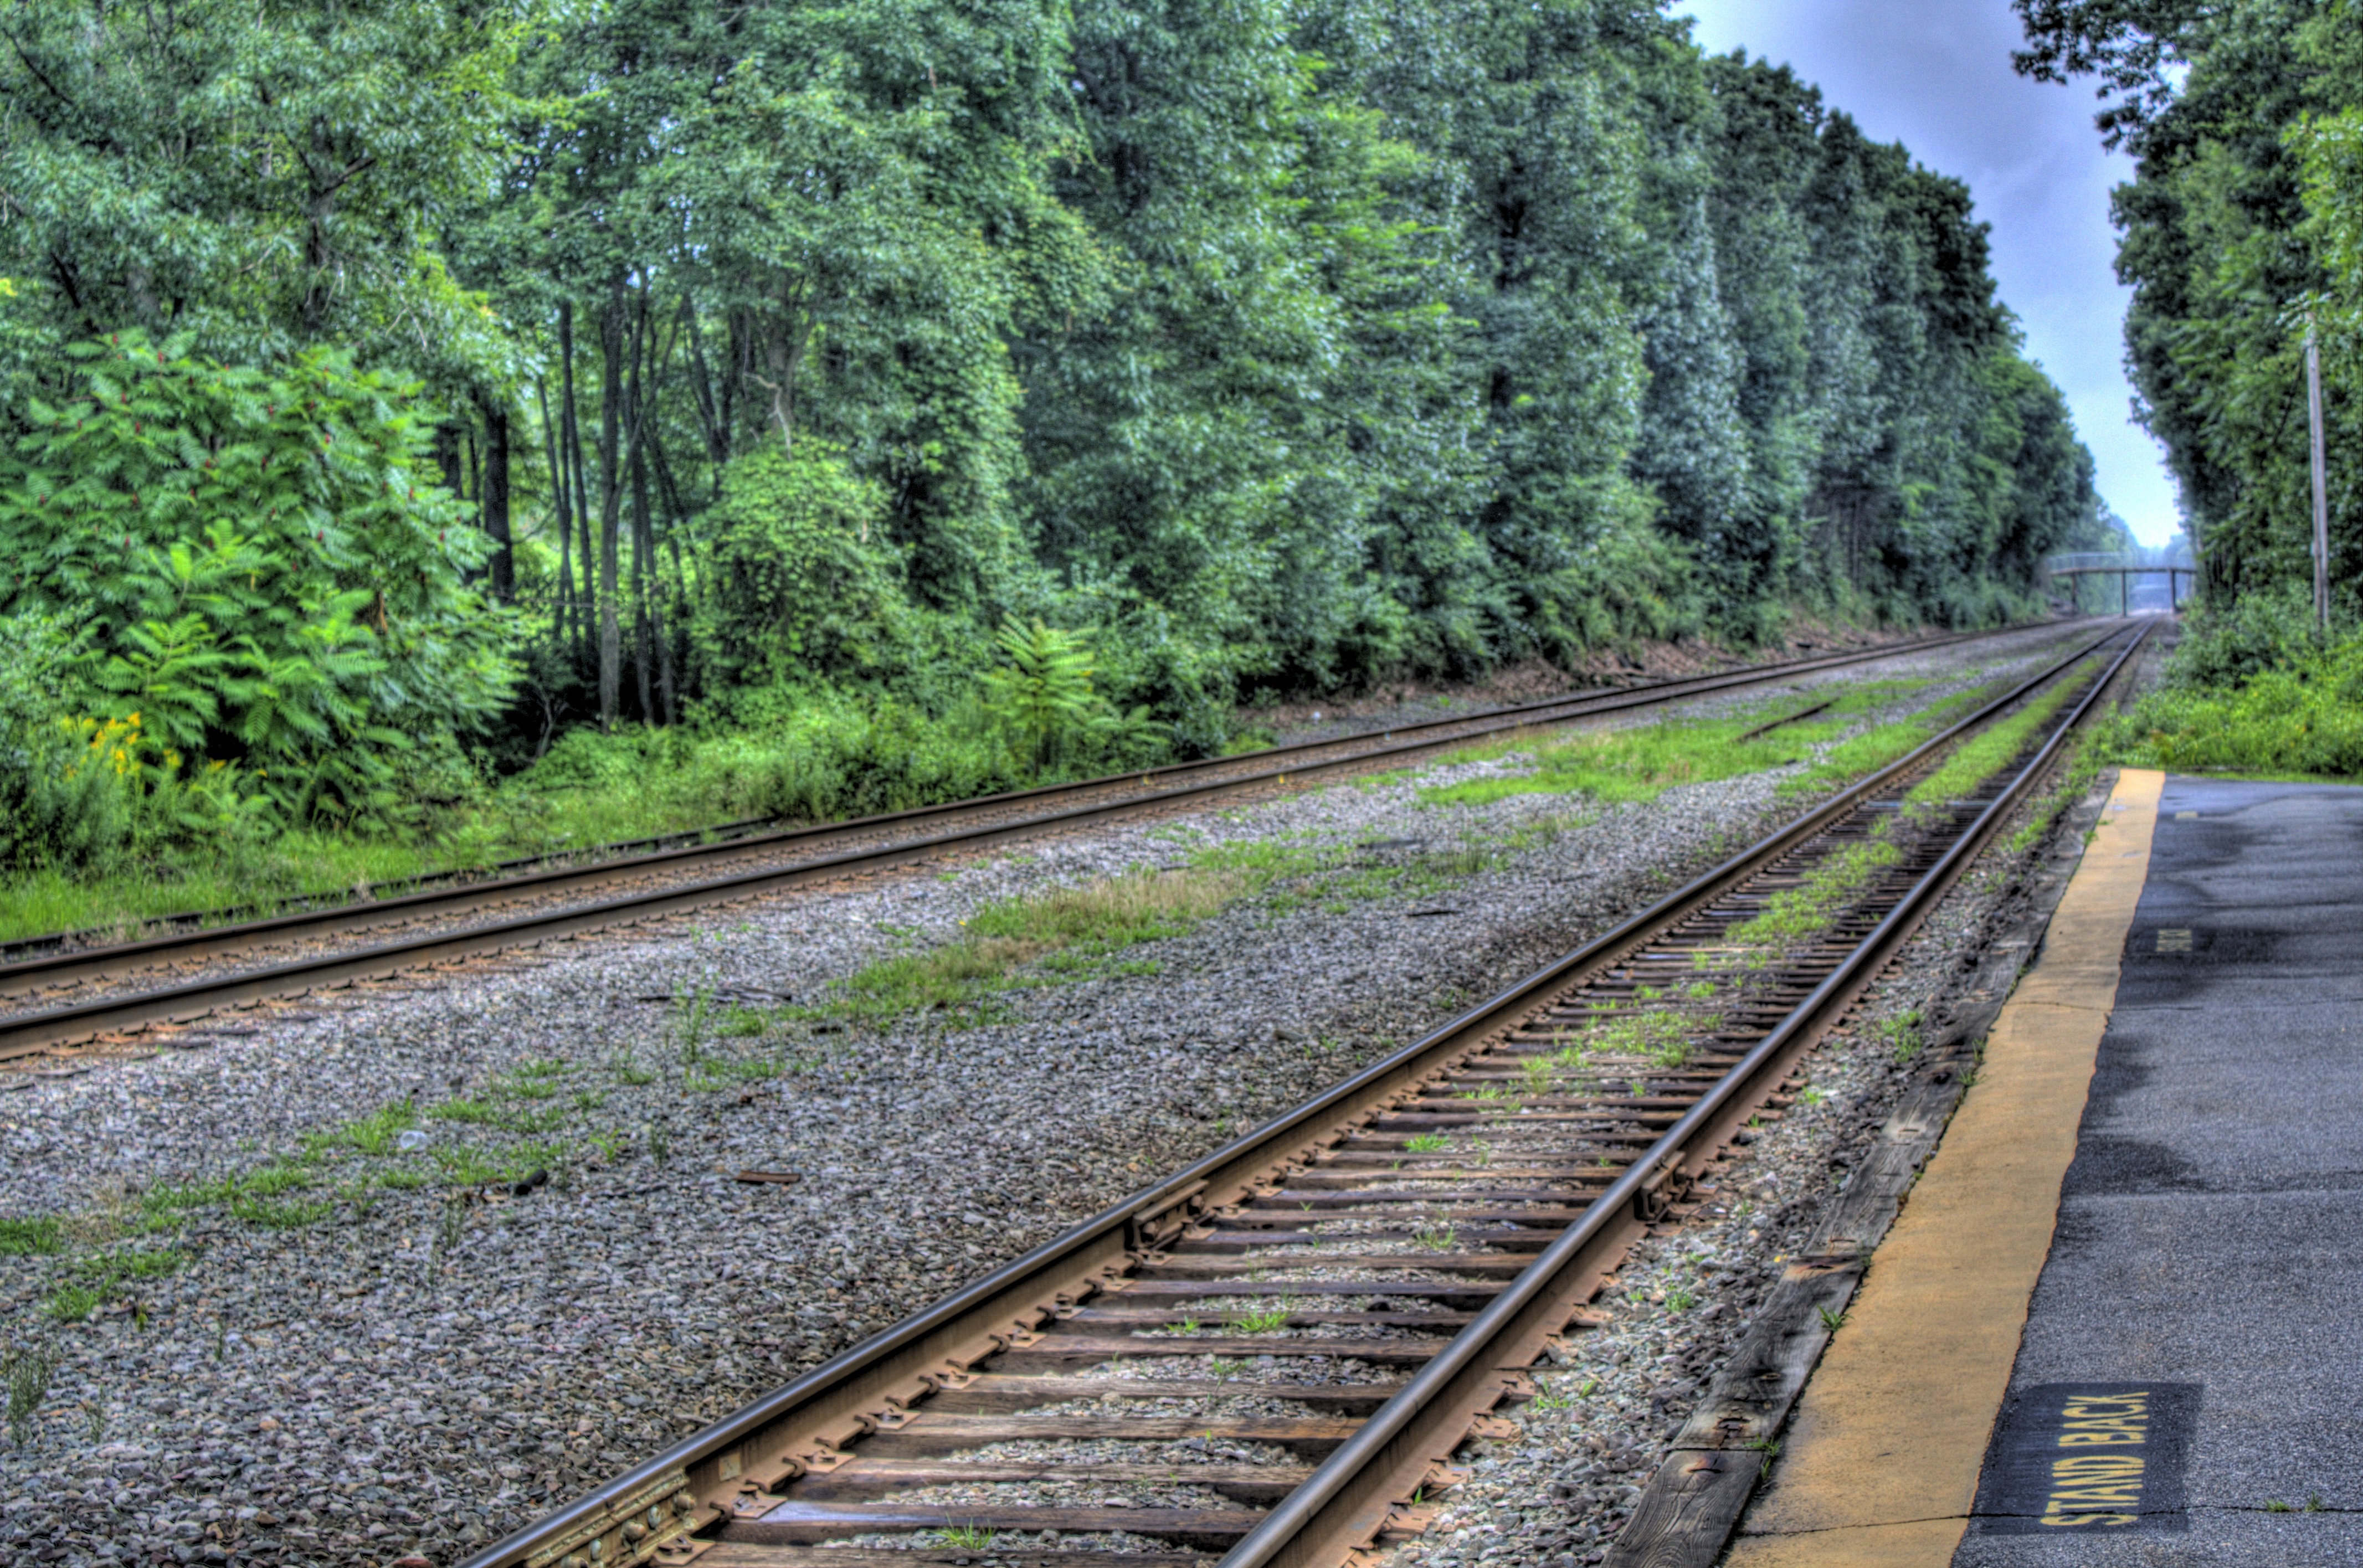 File:LIncoln MA HDR Train Tracks.jpg - Wikimedia Commons